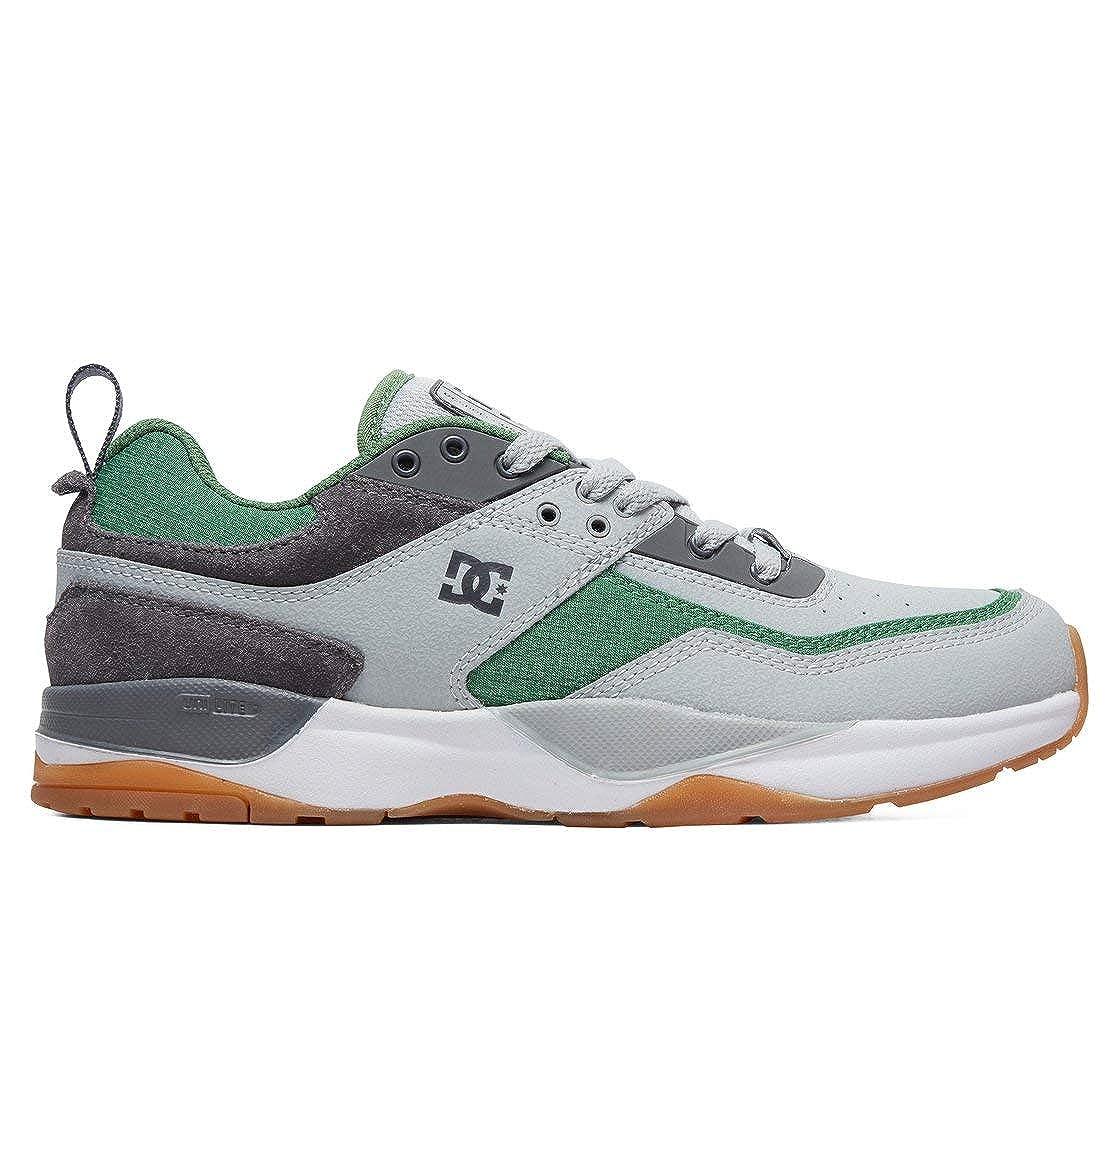 gris  vert 45 EU DC chaussures E.tribeka, E.tribeka Homme